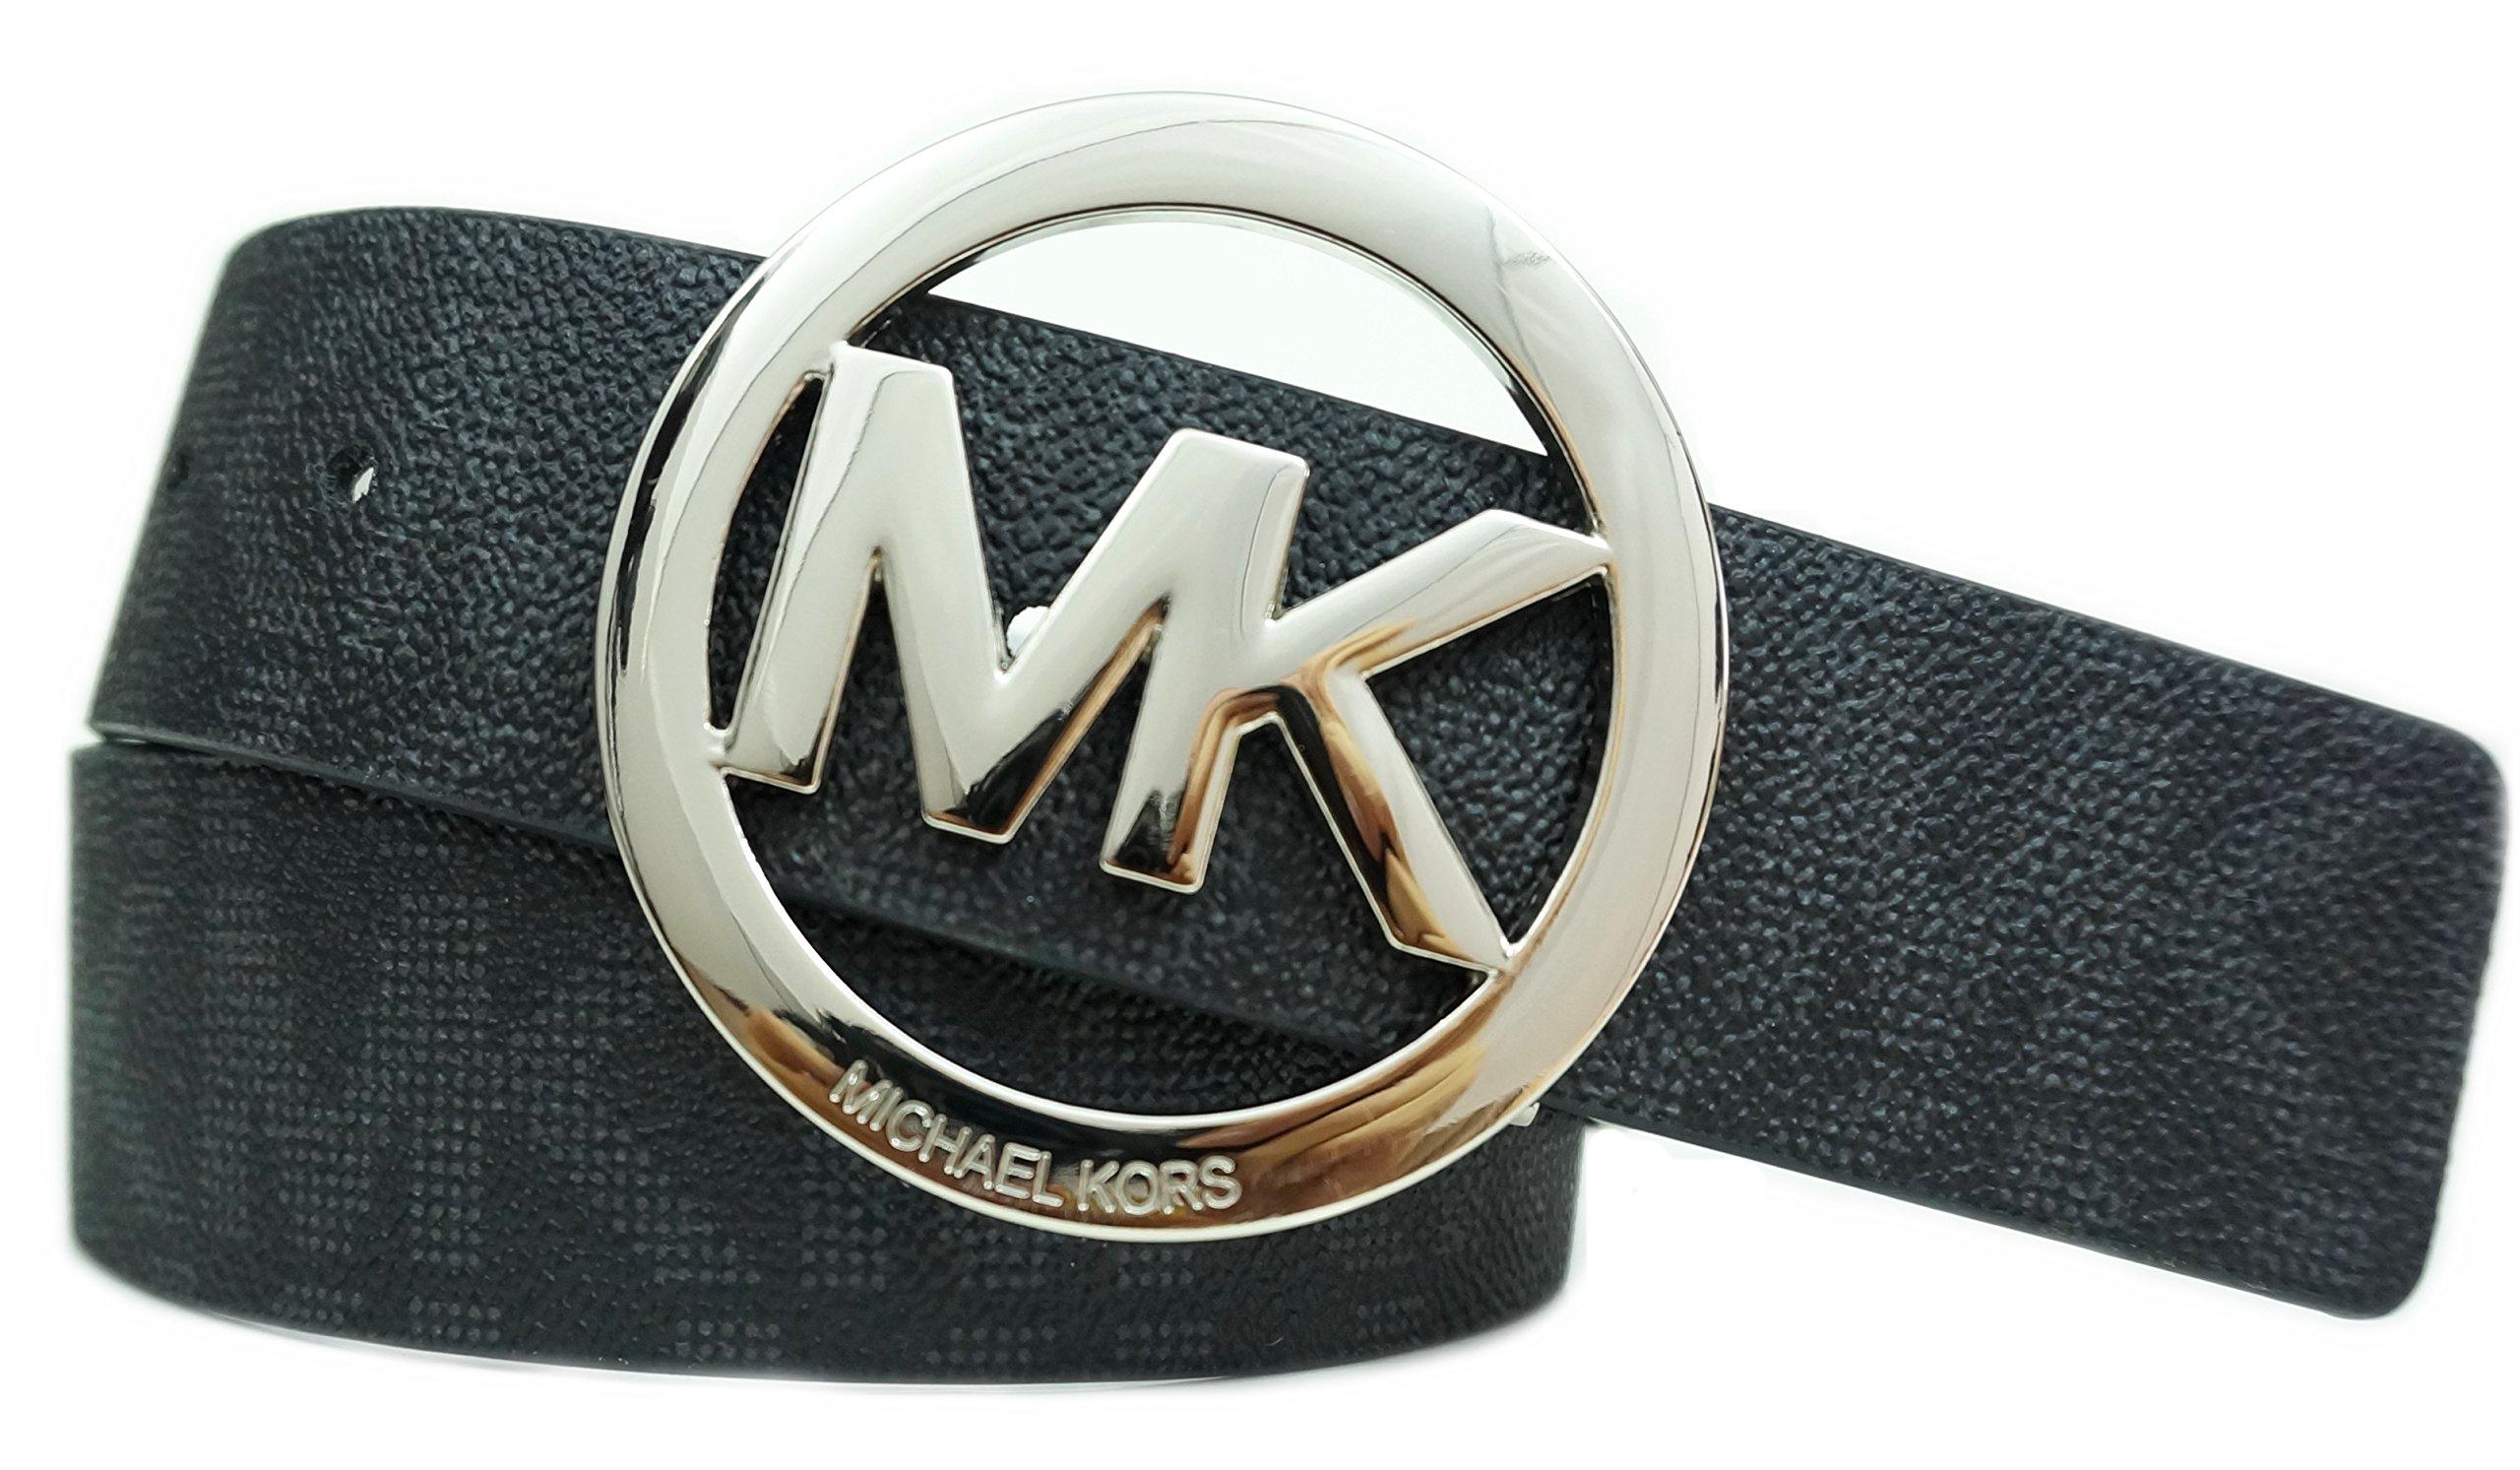 MICHAEL Michael Kors Belt (Large), Black , Silver Buckle by Michael Kors